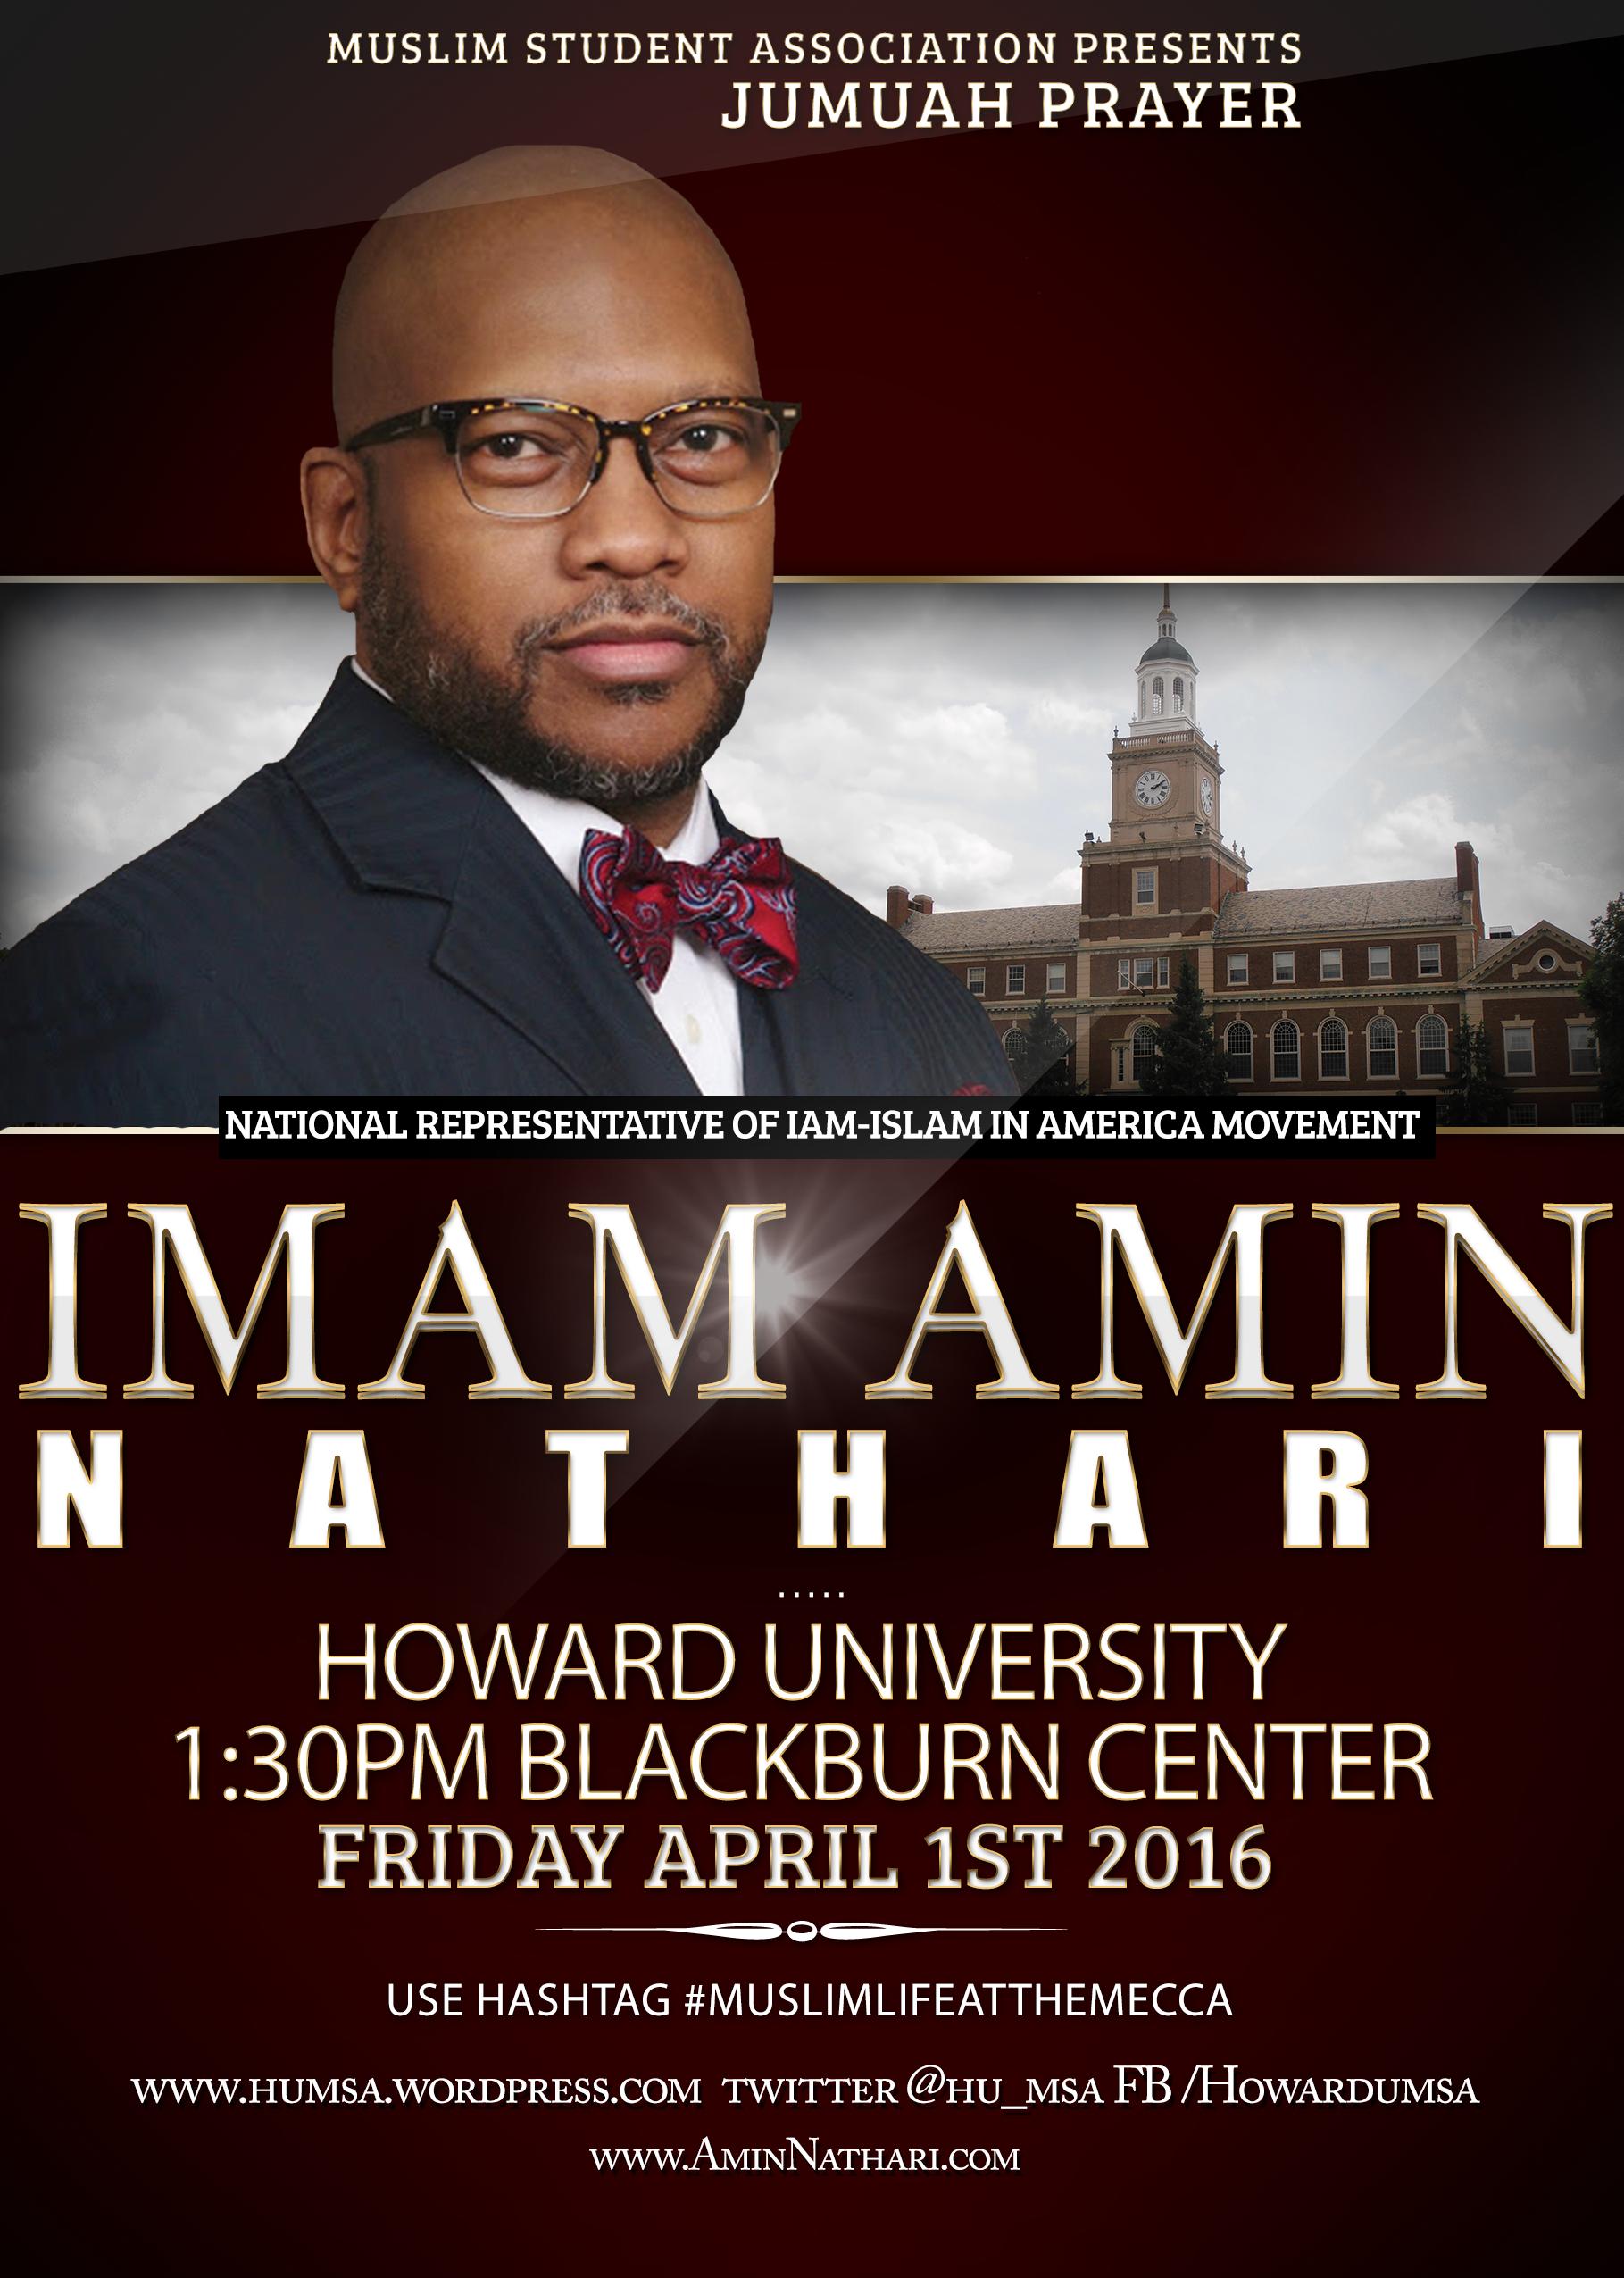 imam-amin-nathari-jumuah-at-howard-university-april-1-2016-mecca-digitale